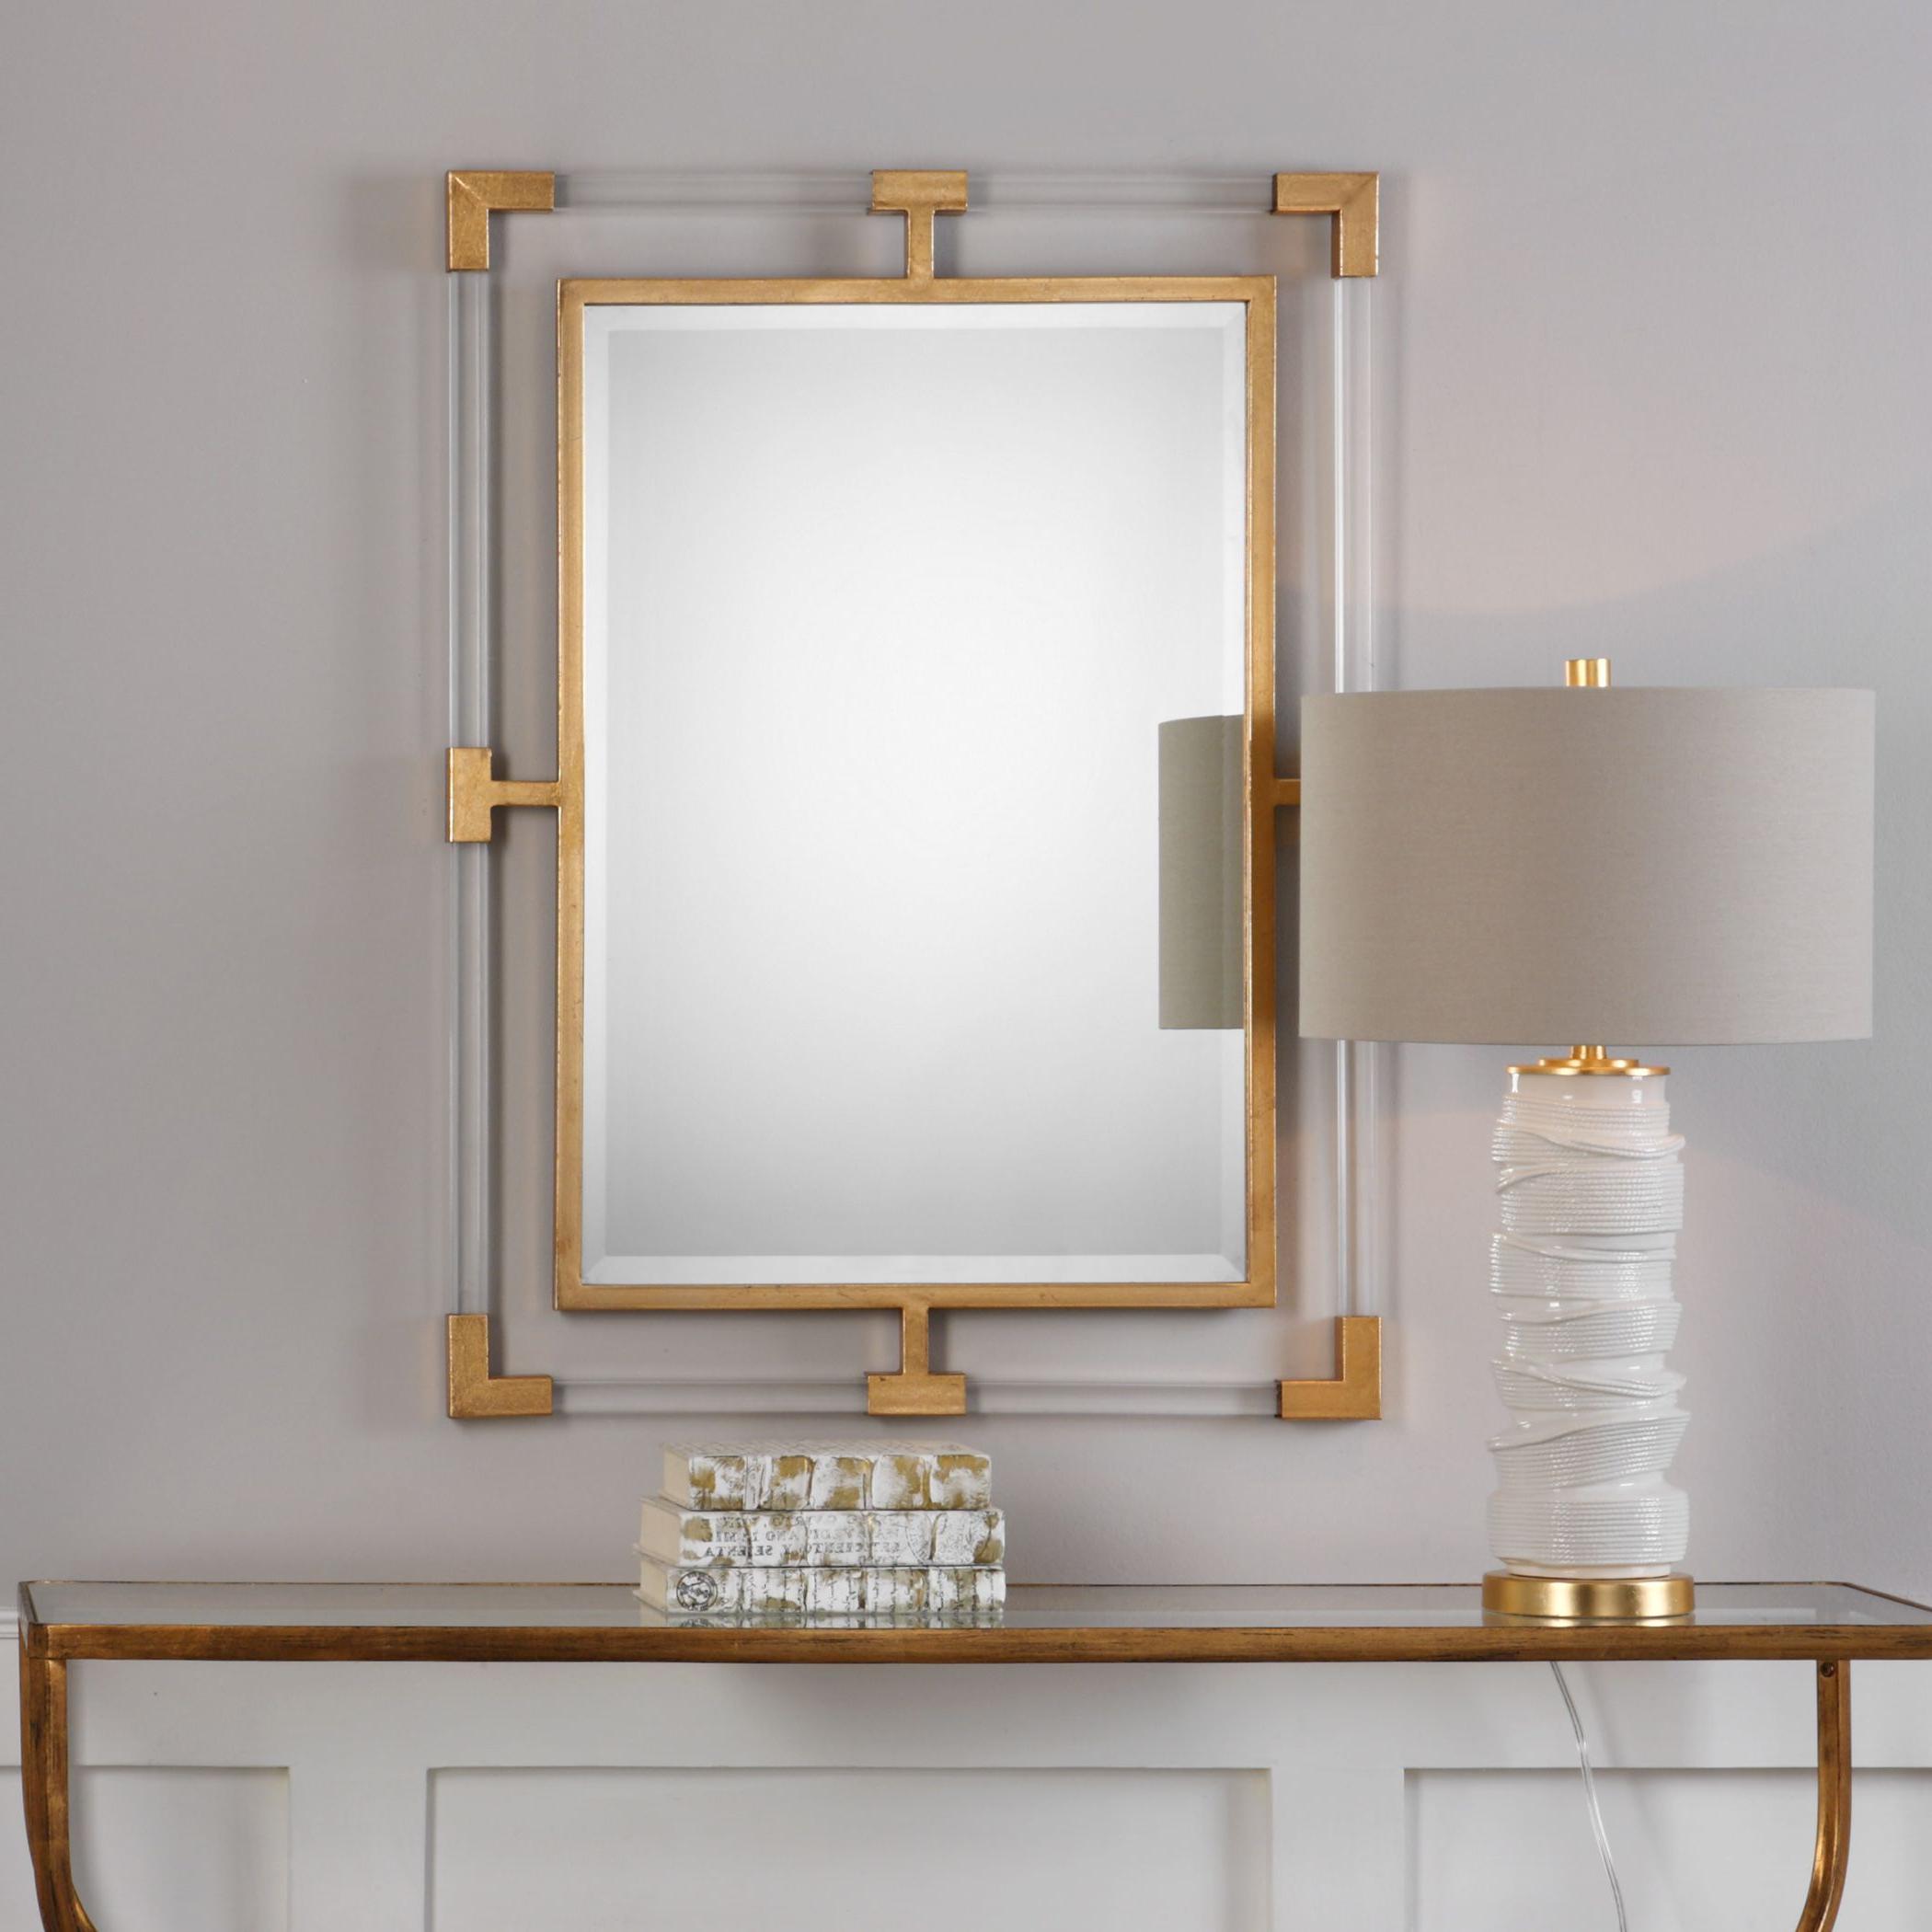 Current Balkan Modern Gold Wall Mirror – 27.5x37.5x (View 6 of 20)